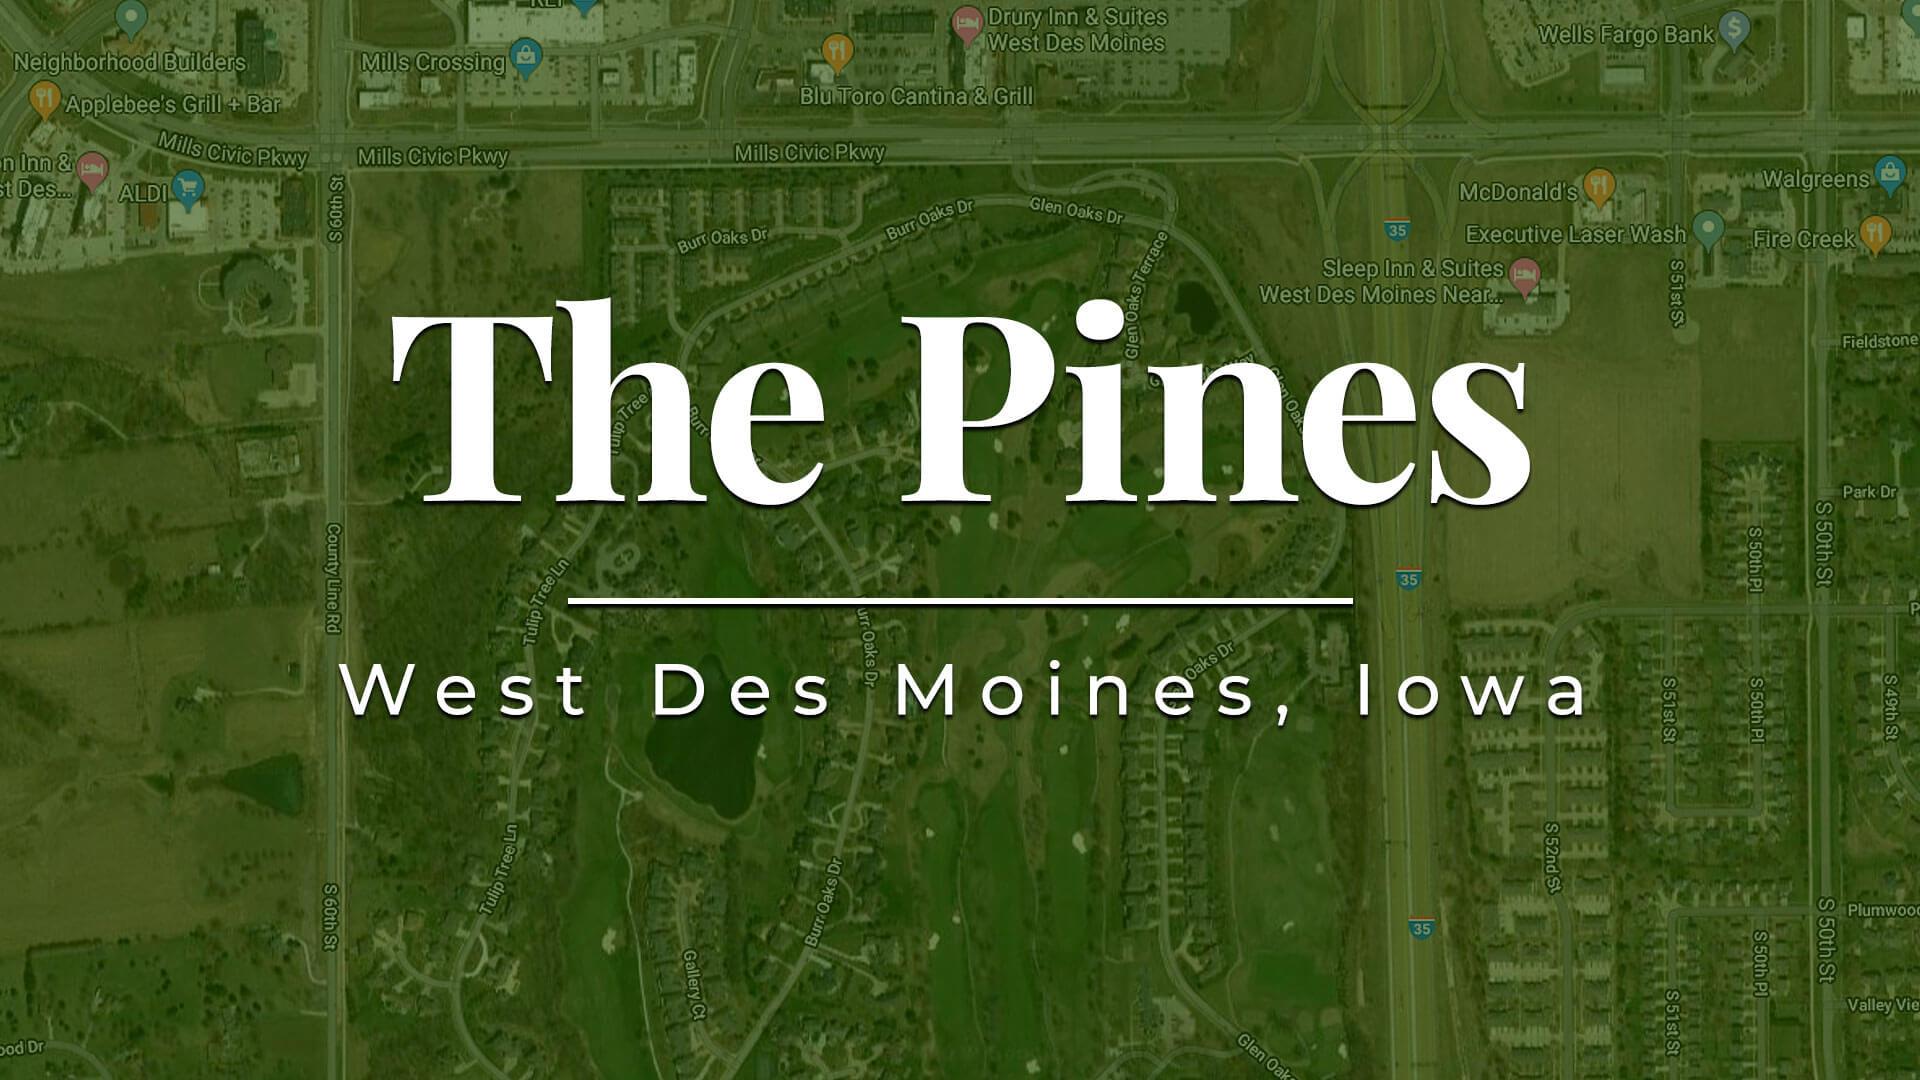 The Pines Housing Development in West Des Moines, Iowa